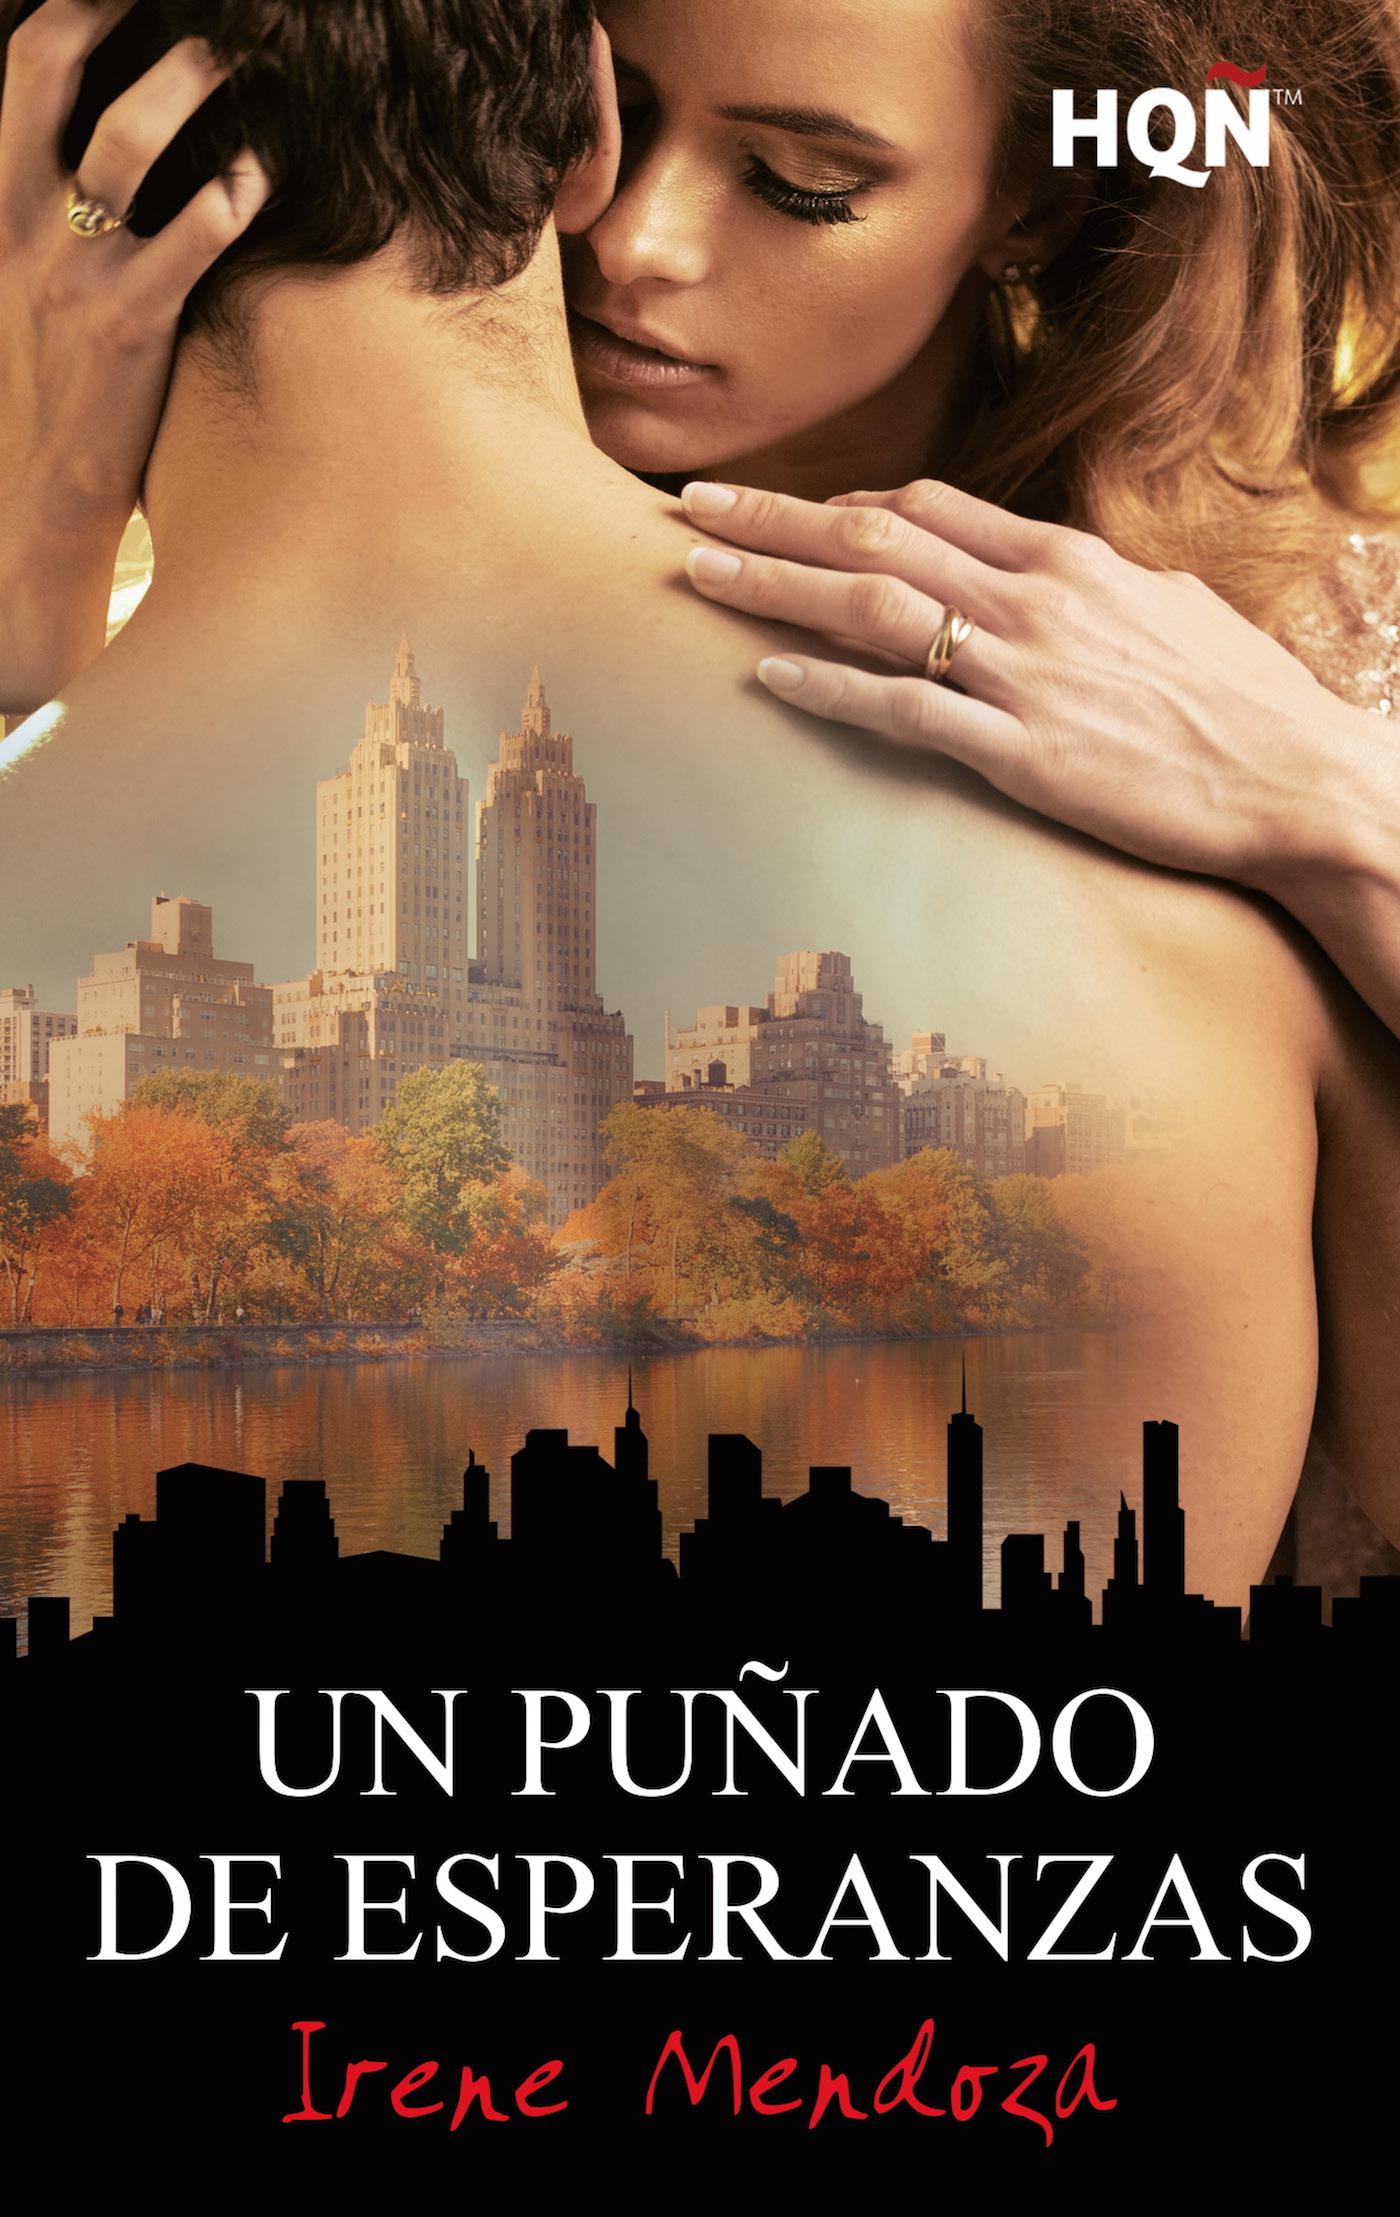 Irene Mendoza Un puñado de esperanzas mendoza mendoza рюкзак для подростков этника черно оранжевый